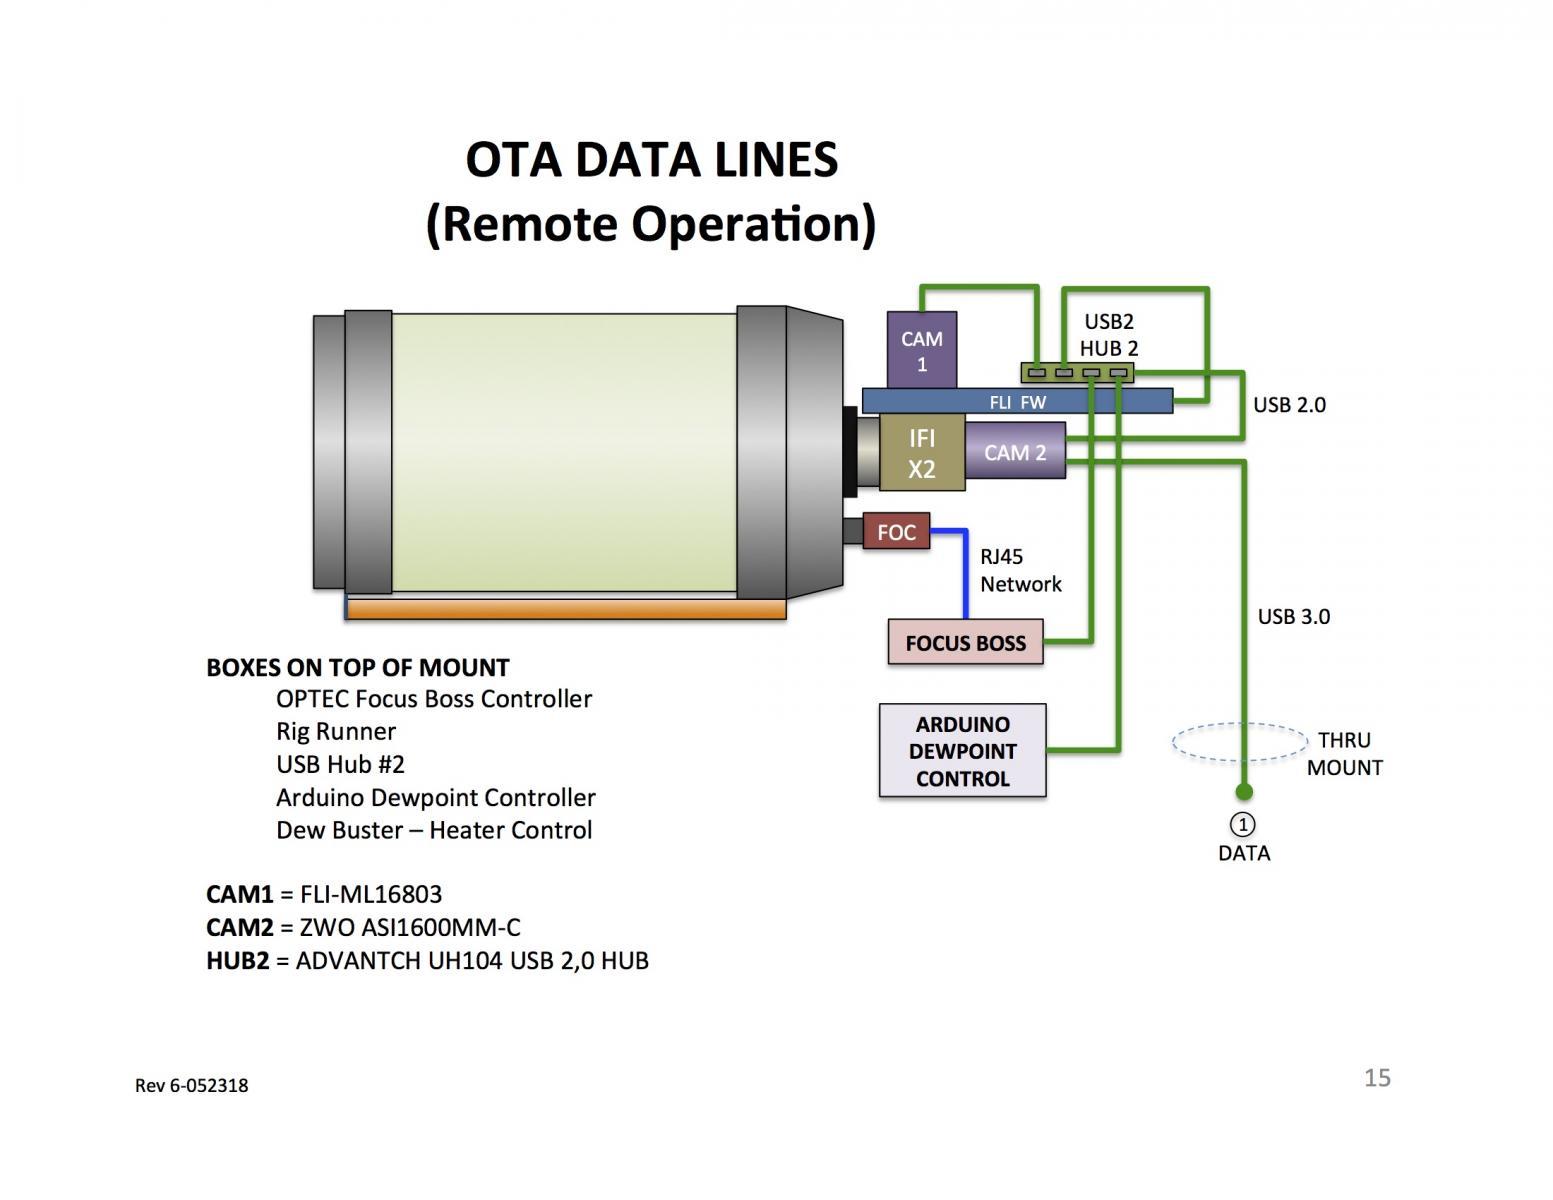 0FA07 C14 Wiring Diagram | Digital Resources on c80 wiring diagram, harley davidson wiring diagram, c36 wiring diagram, plug wiring diagram, a20 wiring diagram, a4 wiring diagram, c17 wiring diagram, d2 wiring diagram, c60 wiring diagram, wrangler wiring diagram, c10 wiring diagram, suburban wiring diagram, mustang wiring diagram, c61 wiring diagram, h3 wiring diagram, l3 wiring diagram, timer wiring diagram, motion sensor wiring diagram, a2 wiring diagram, relay wiring diagram,